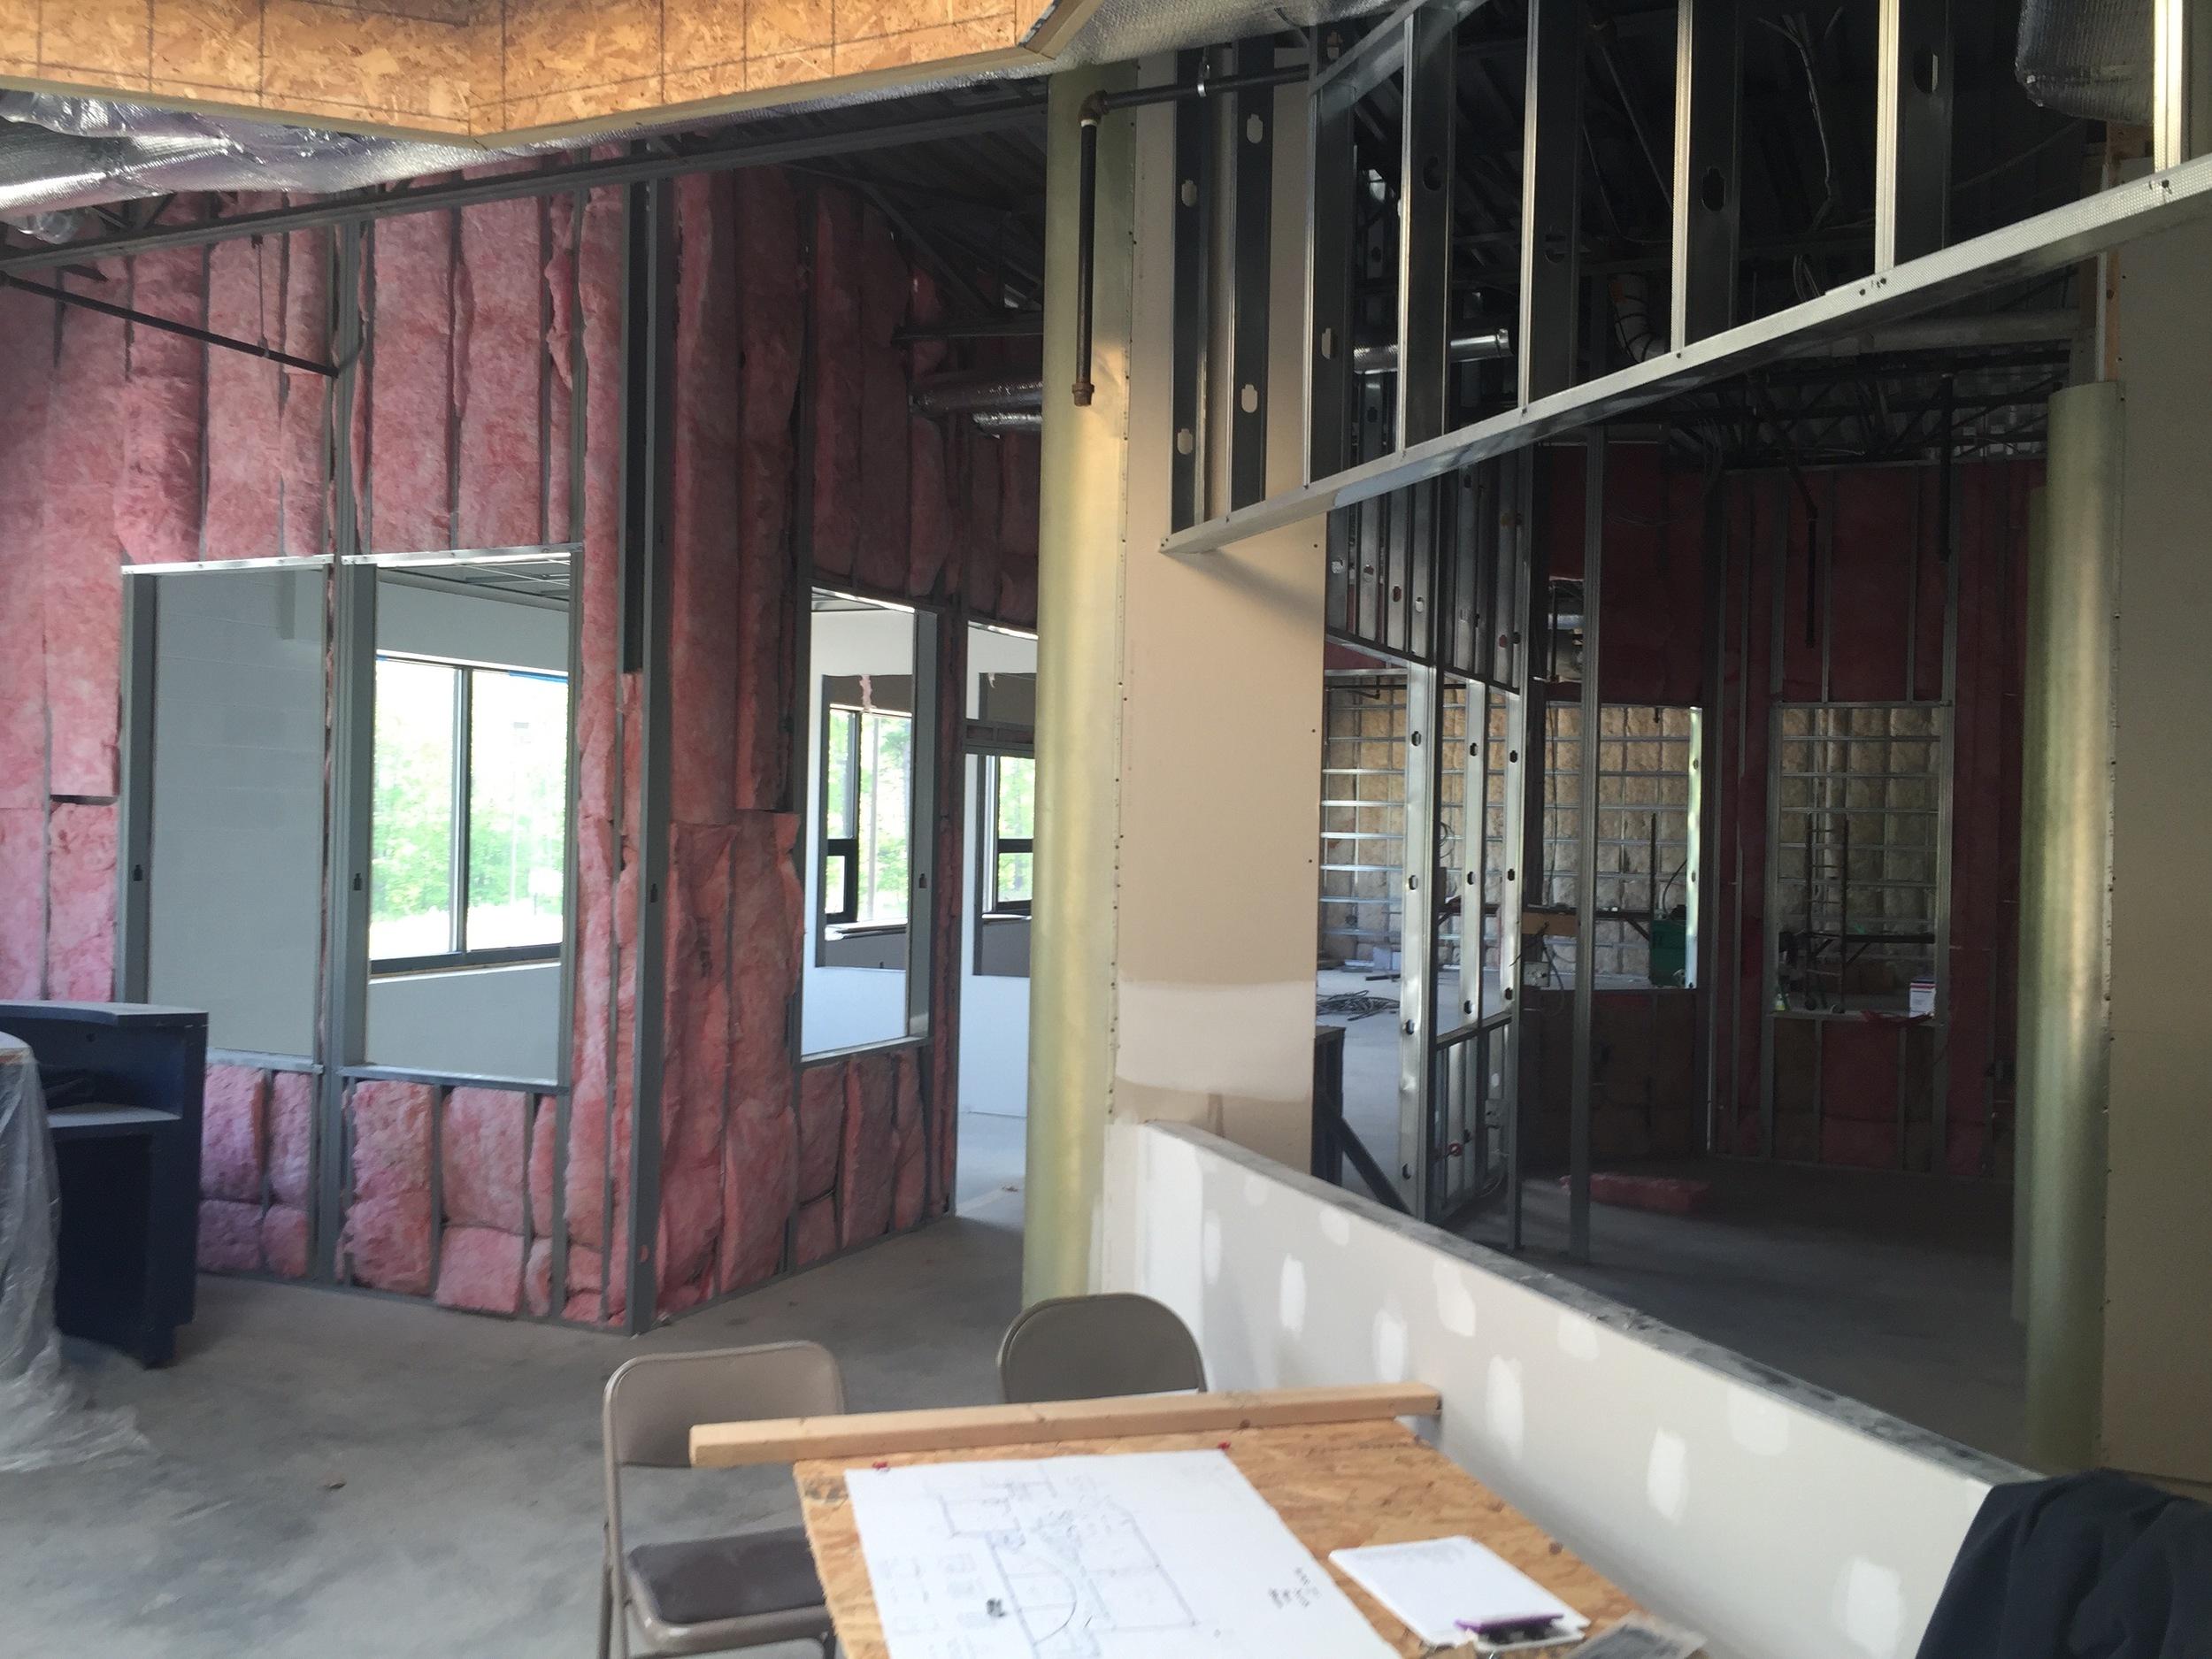 Sanford YMCA Interior.jpg